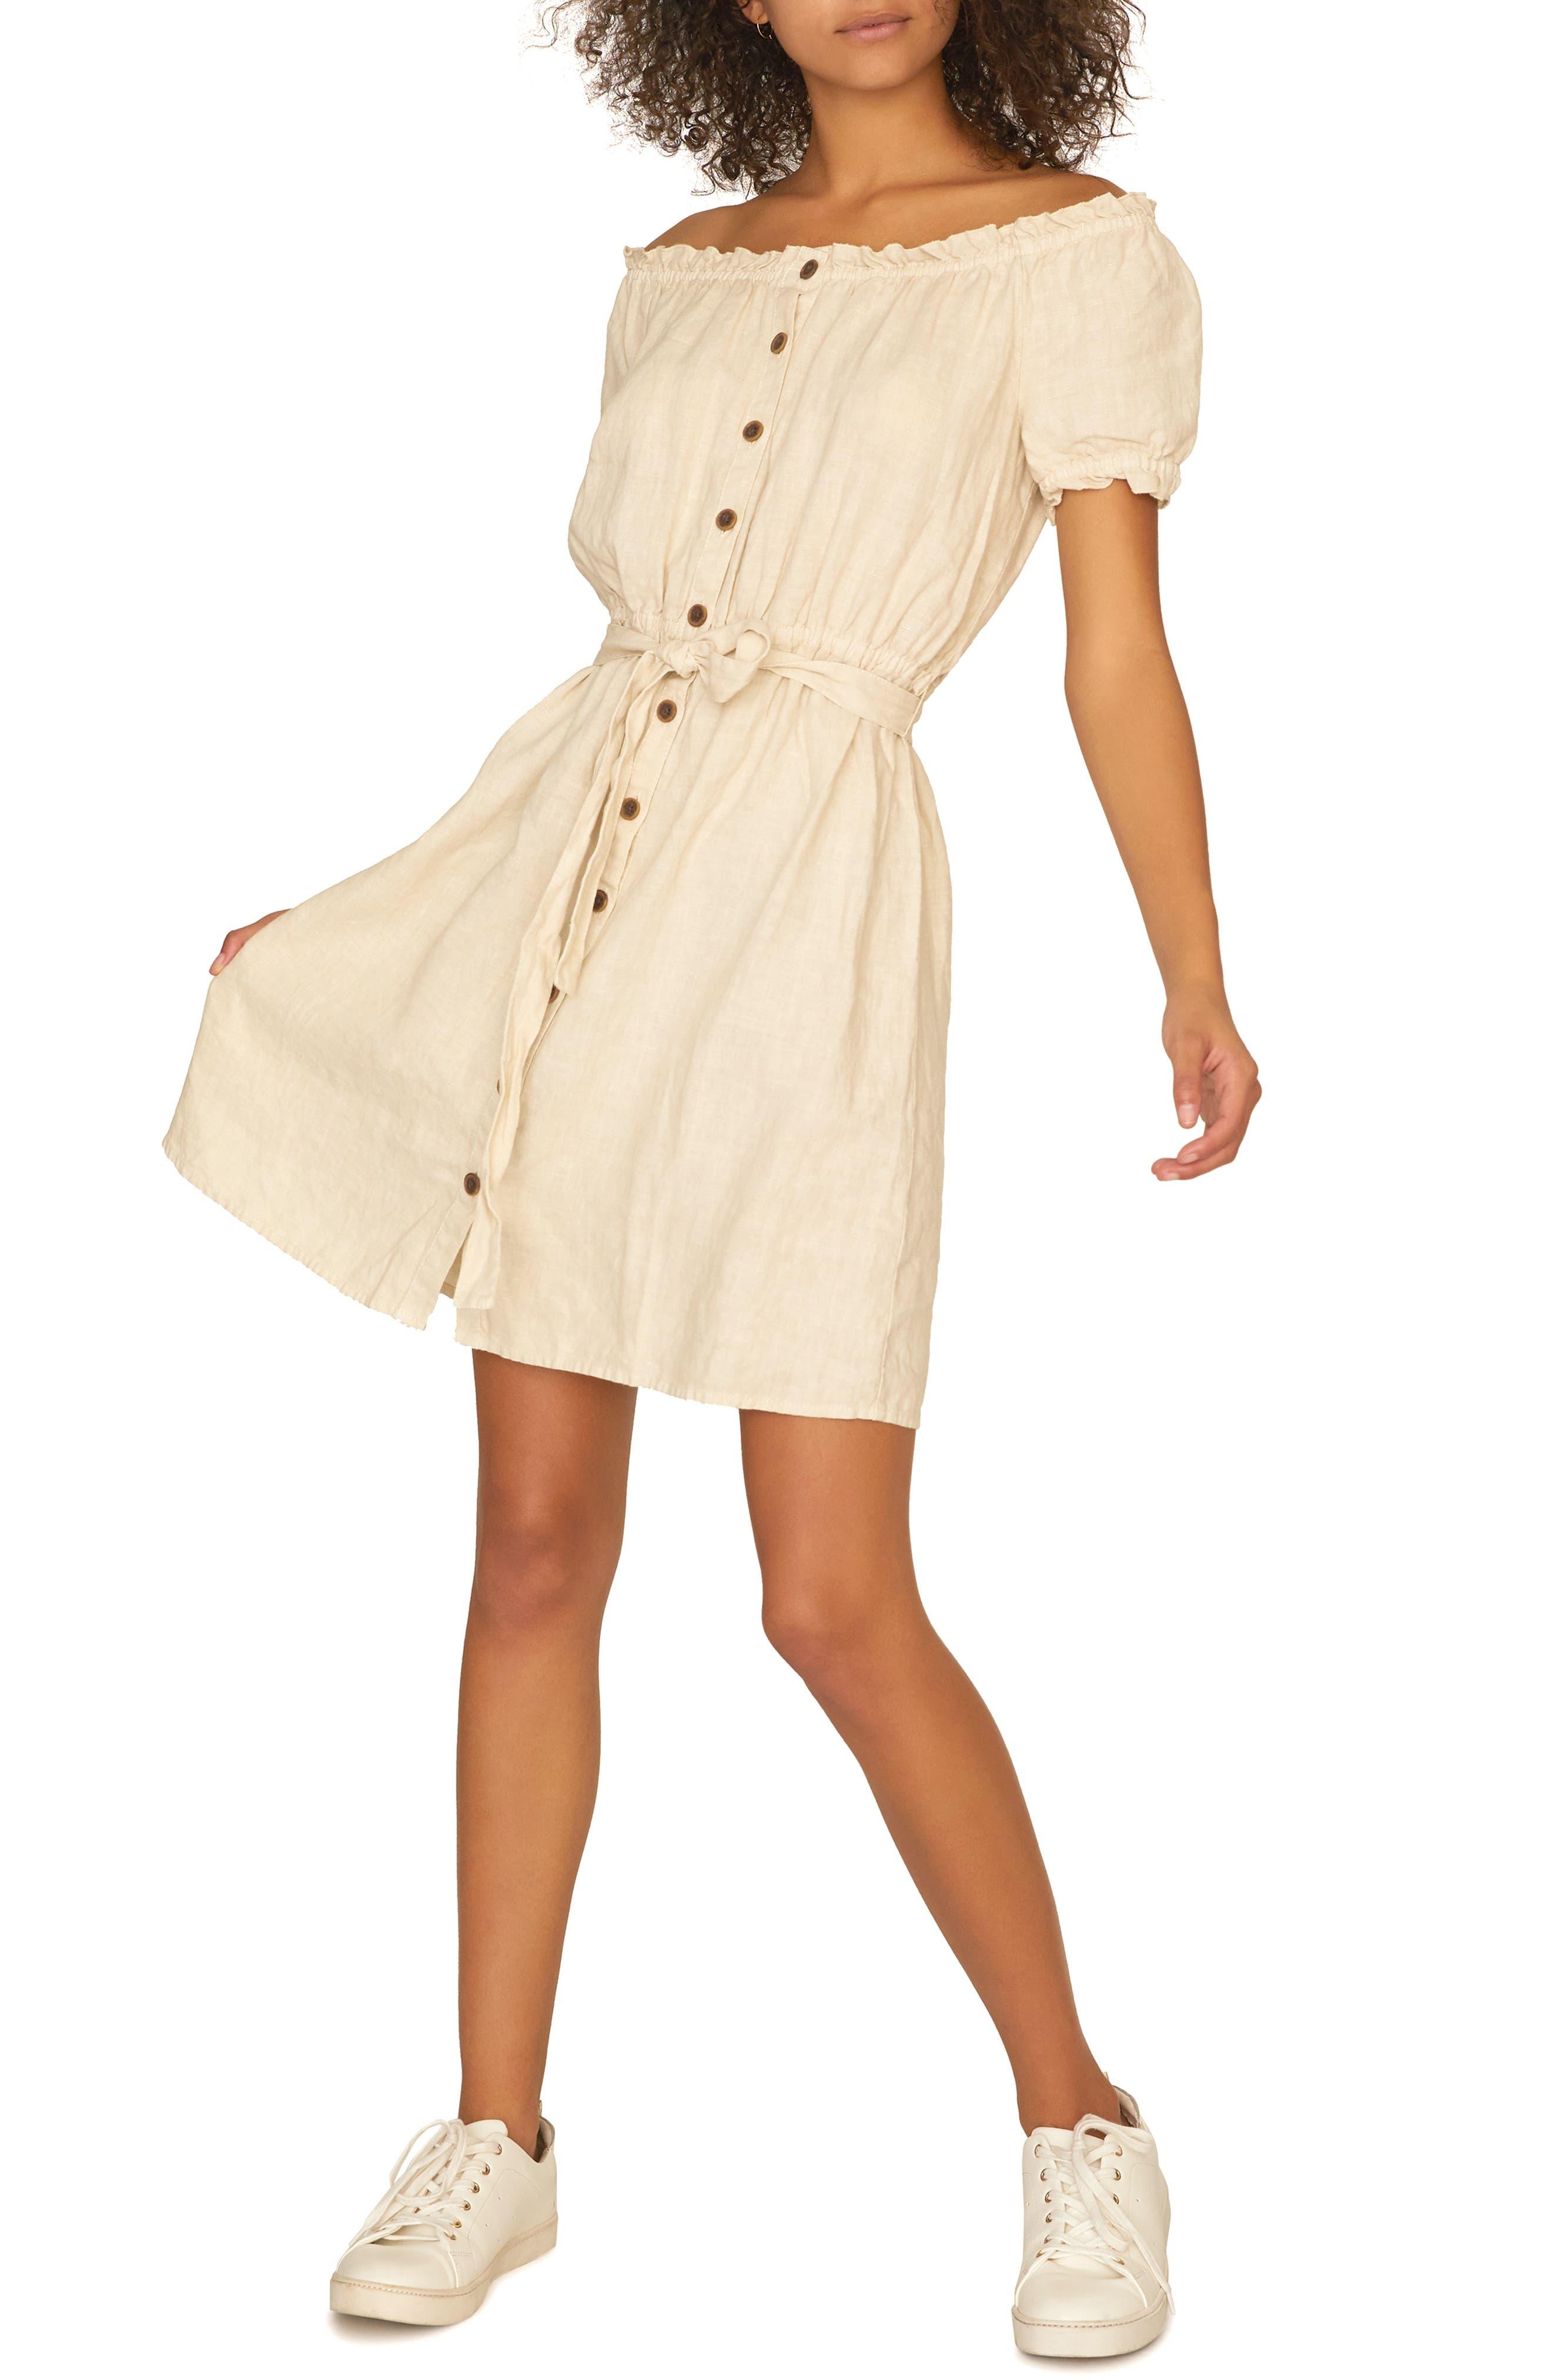 SANCTUARY Washed Linen Off the Shoulder Peasant Dress, Main, color, WASHED PEBBLE